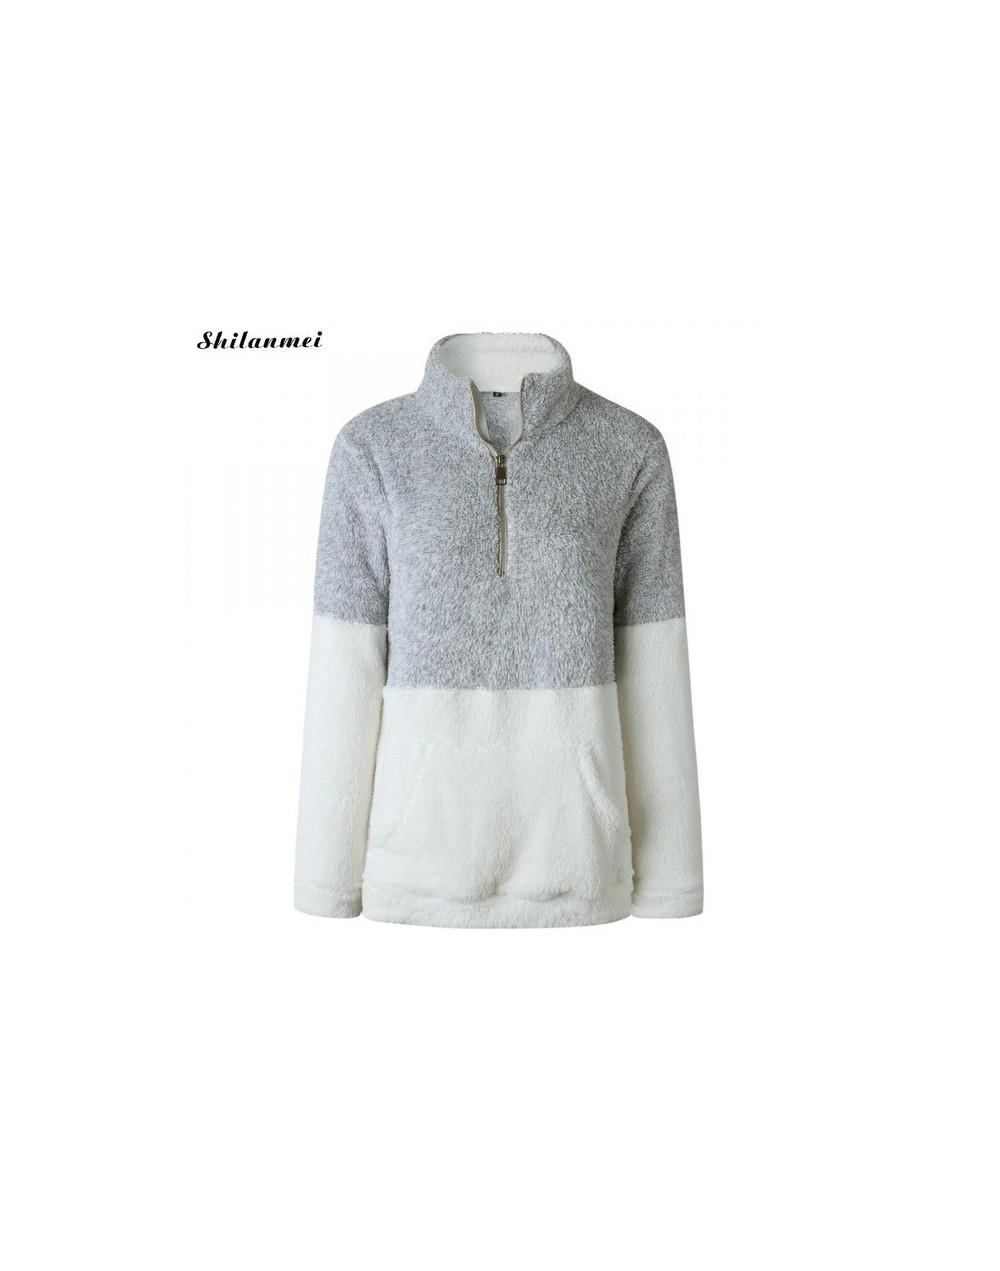 Women's Cozy Oversize Fluffy Woven Sweatshirt Pullover Outwear Turtleneck Women Warm Hoodies Pullover Zip Up Autumn Winter C...